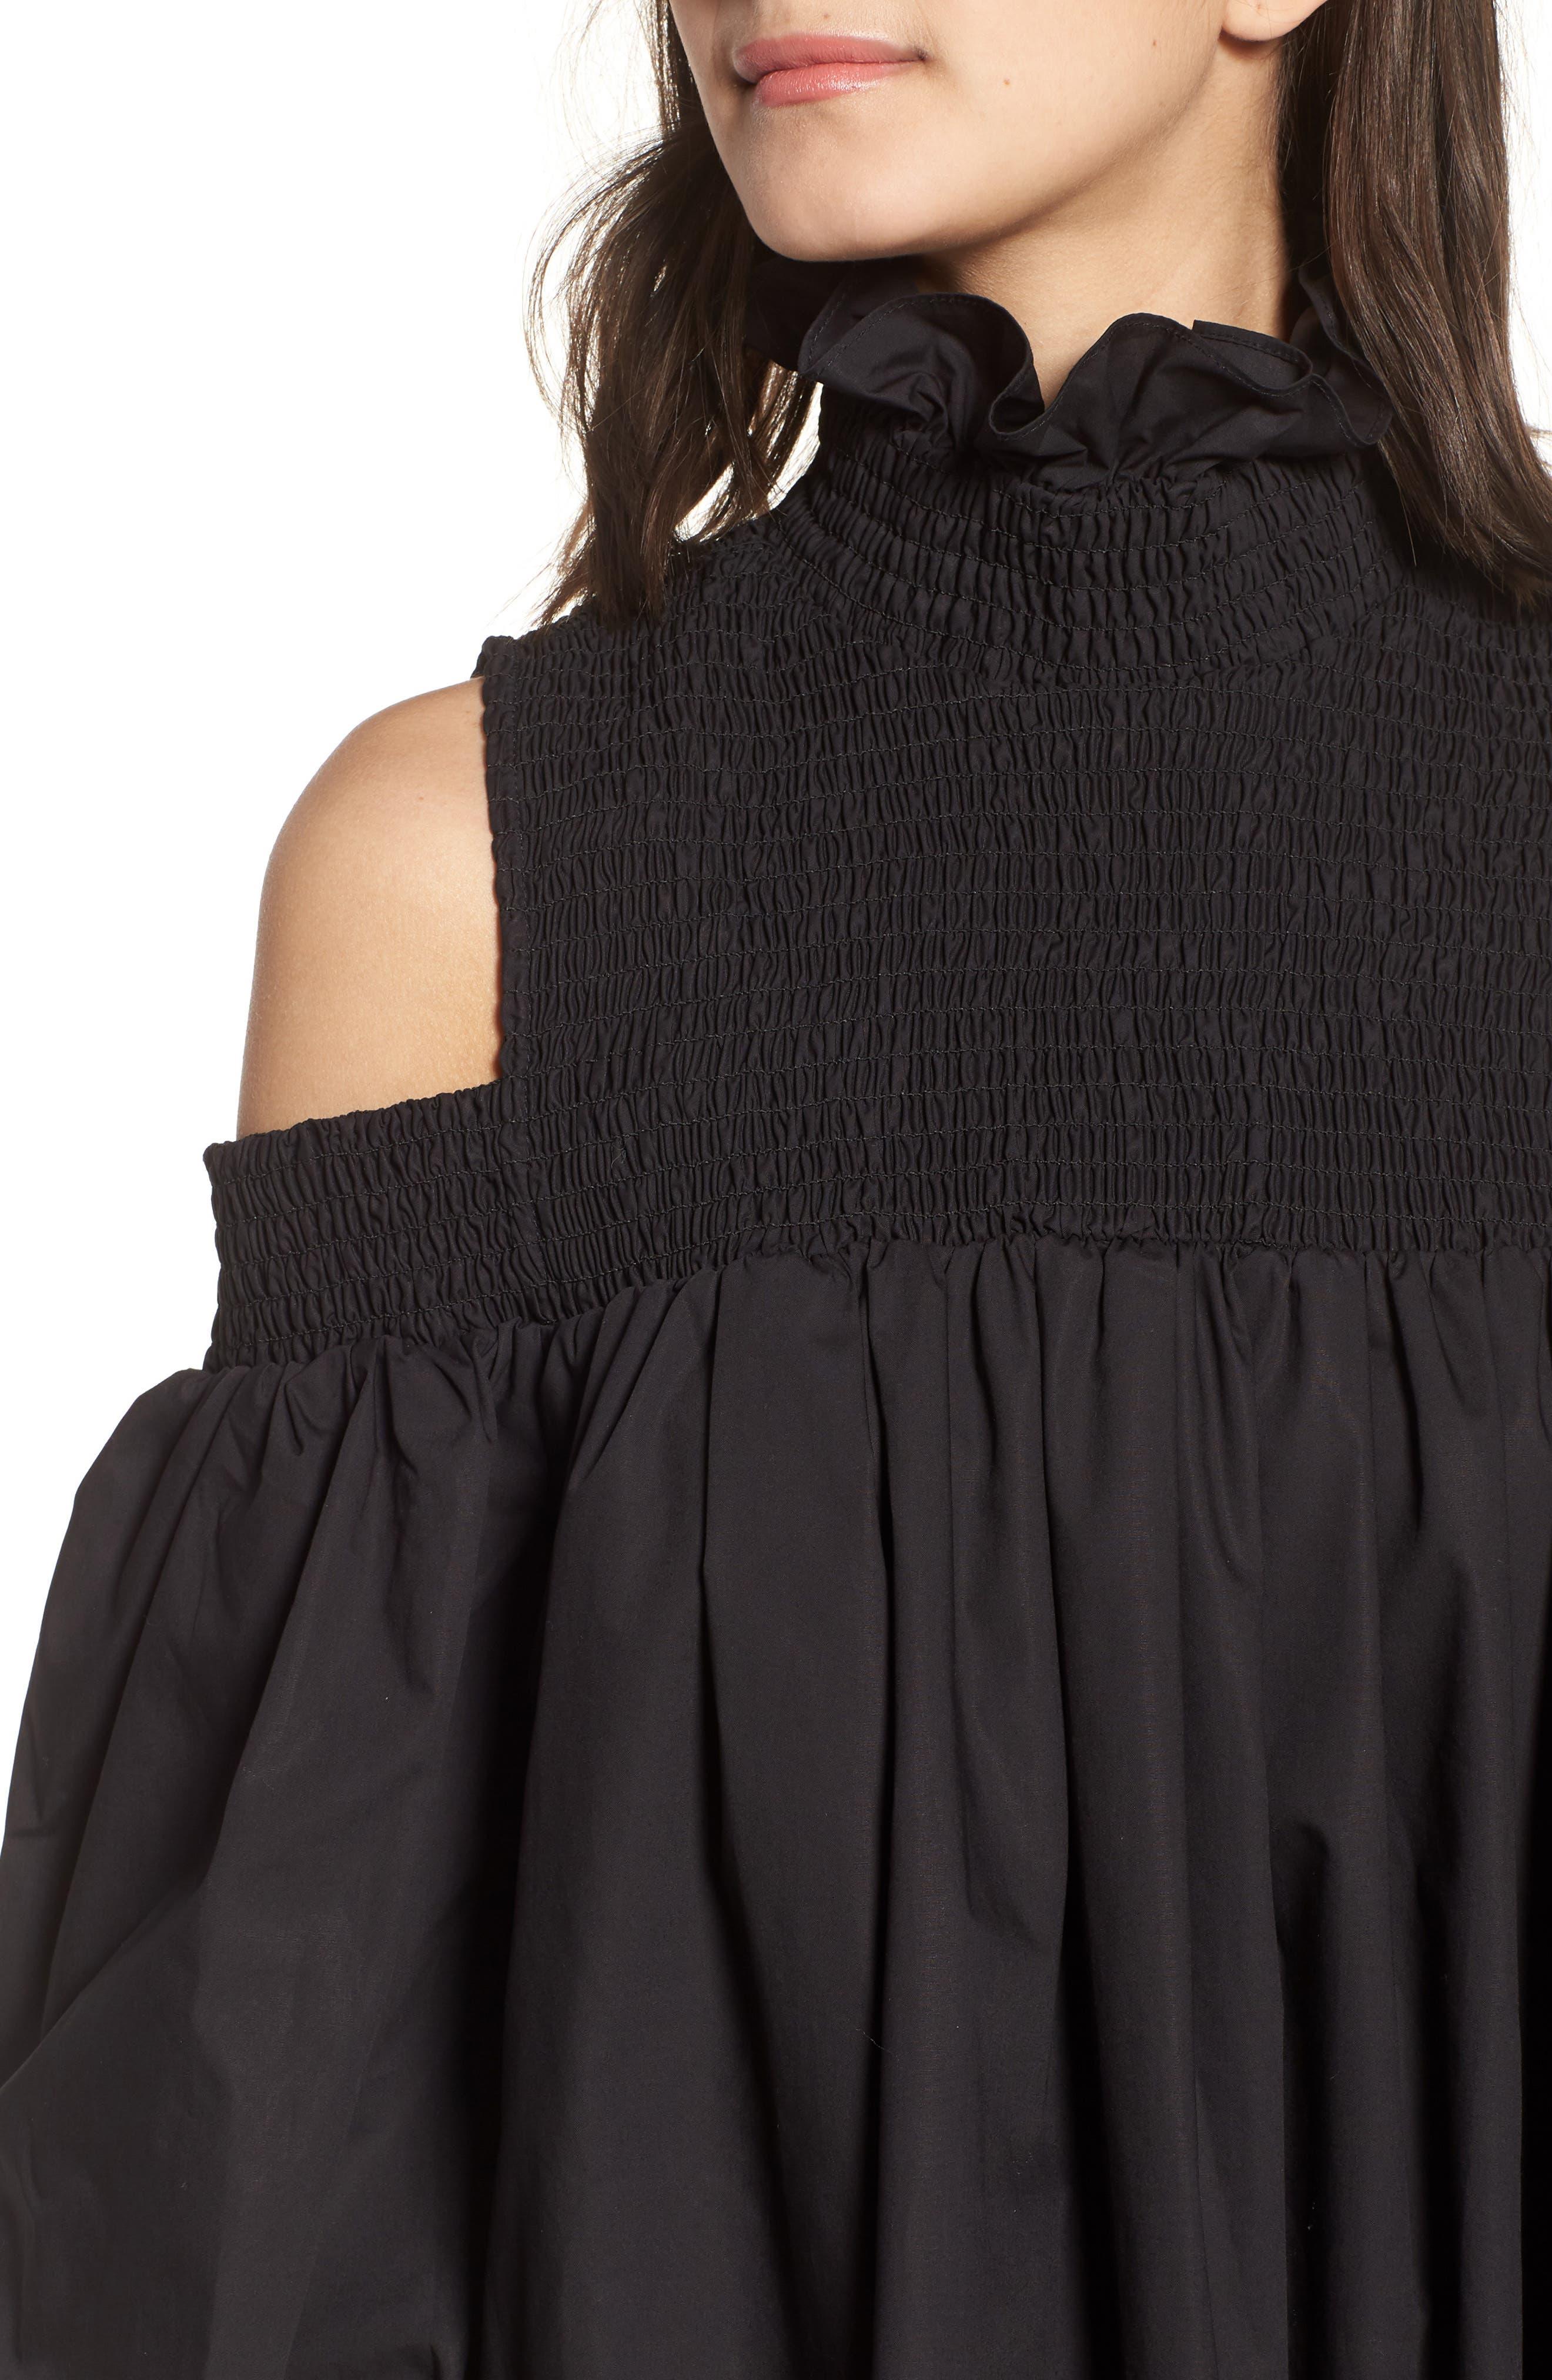 Ivy Cold Shoulder Dress,                             Alternate thumbnail 4, color,                             BLACK COTTON